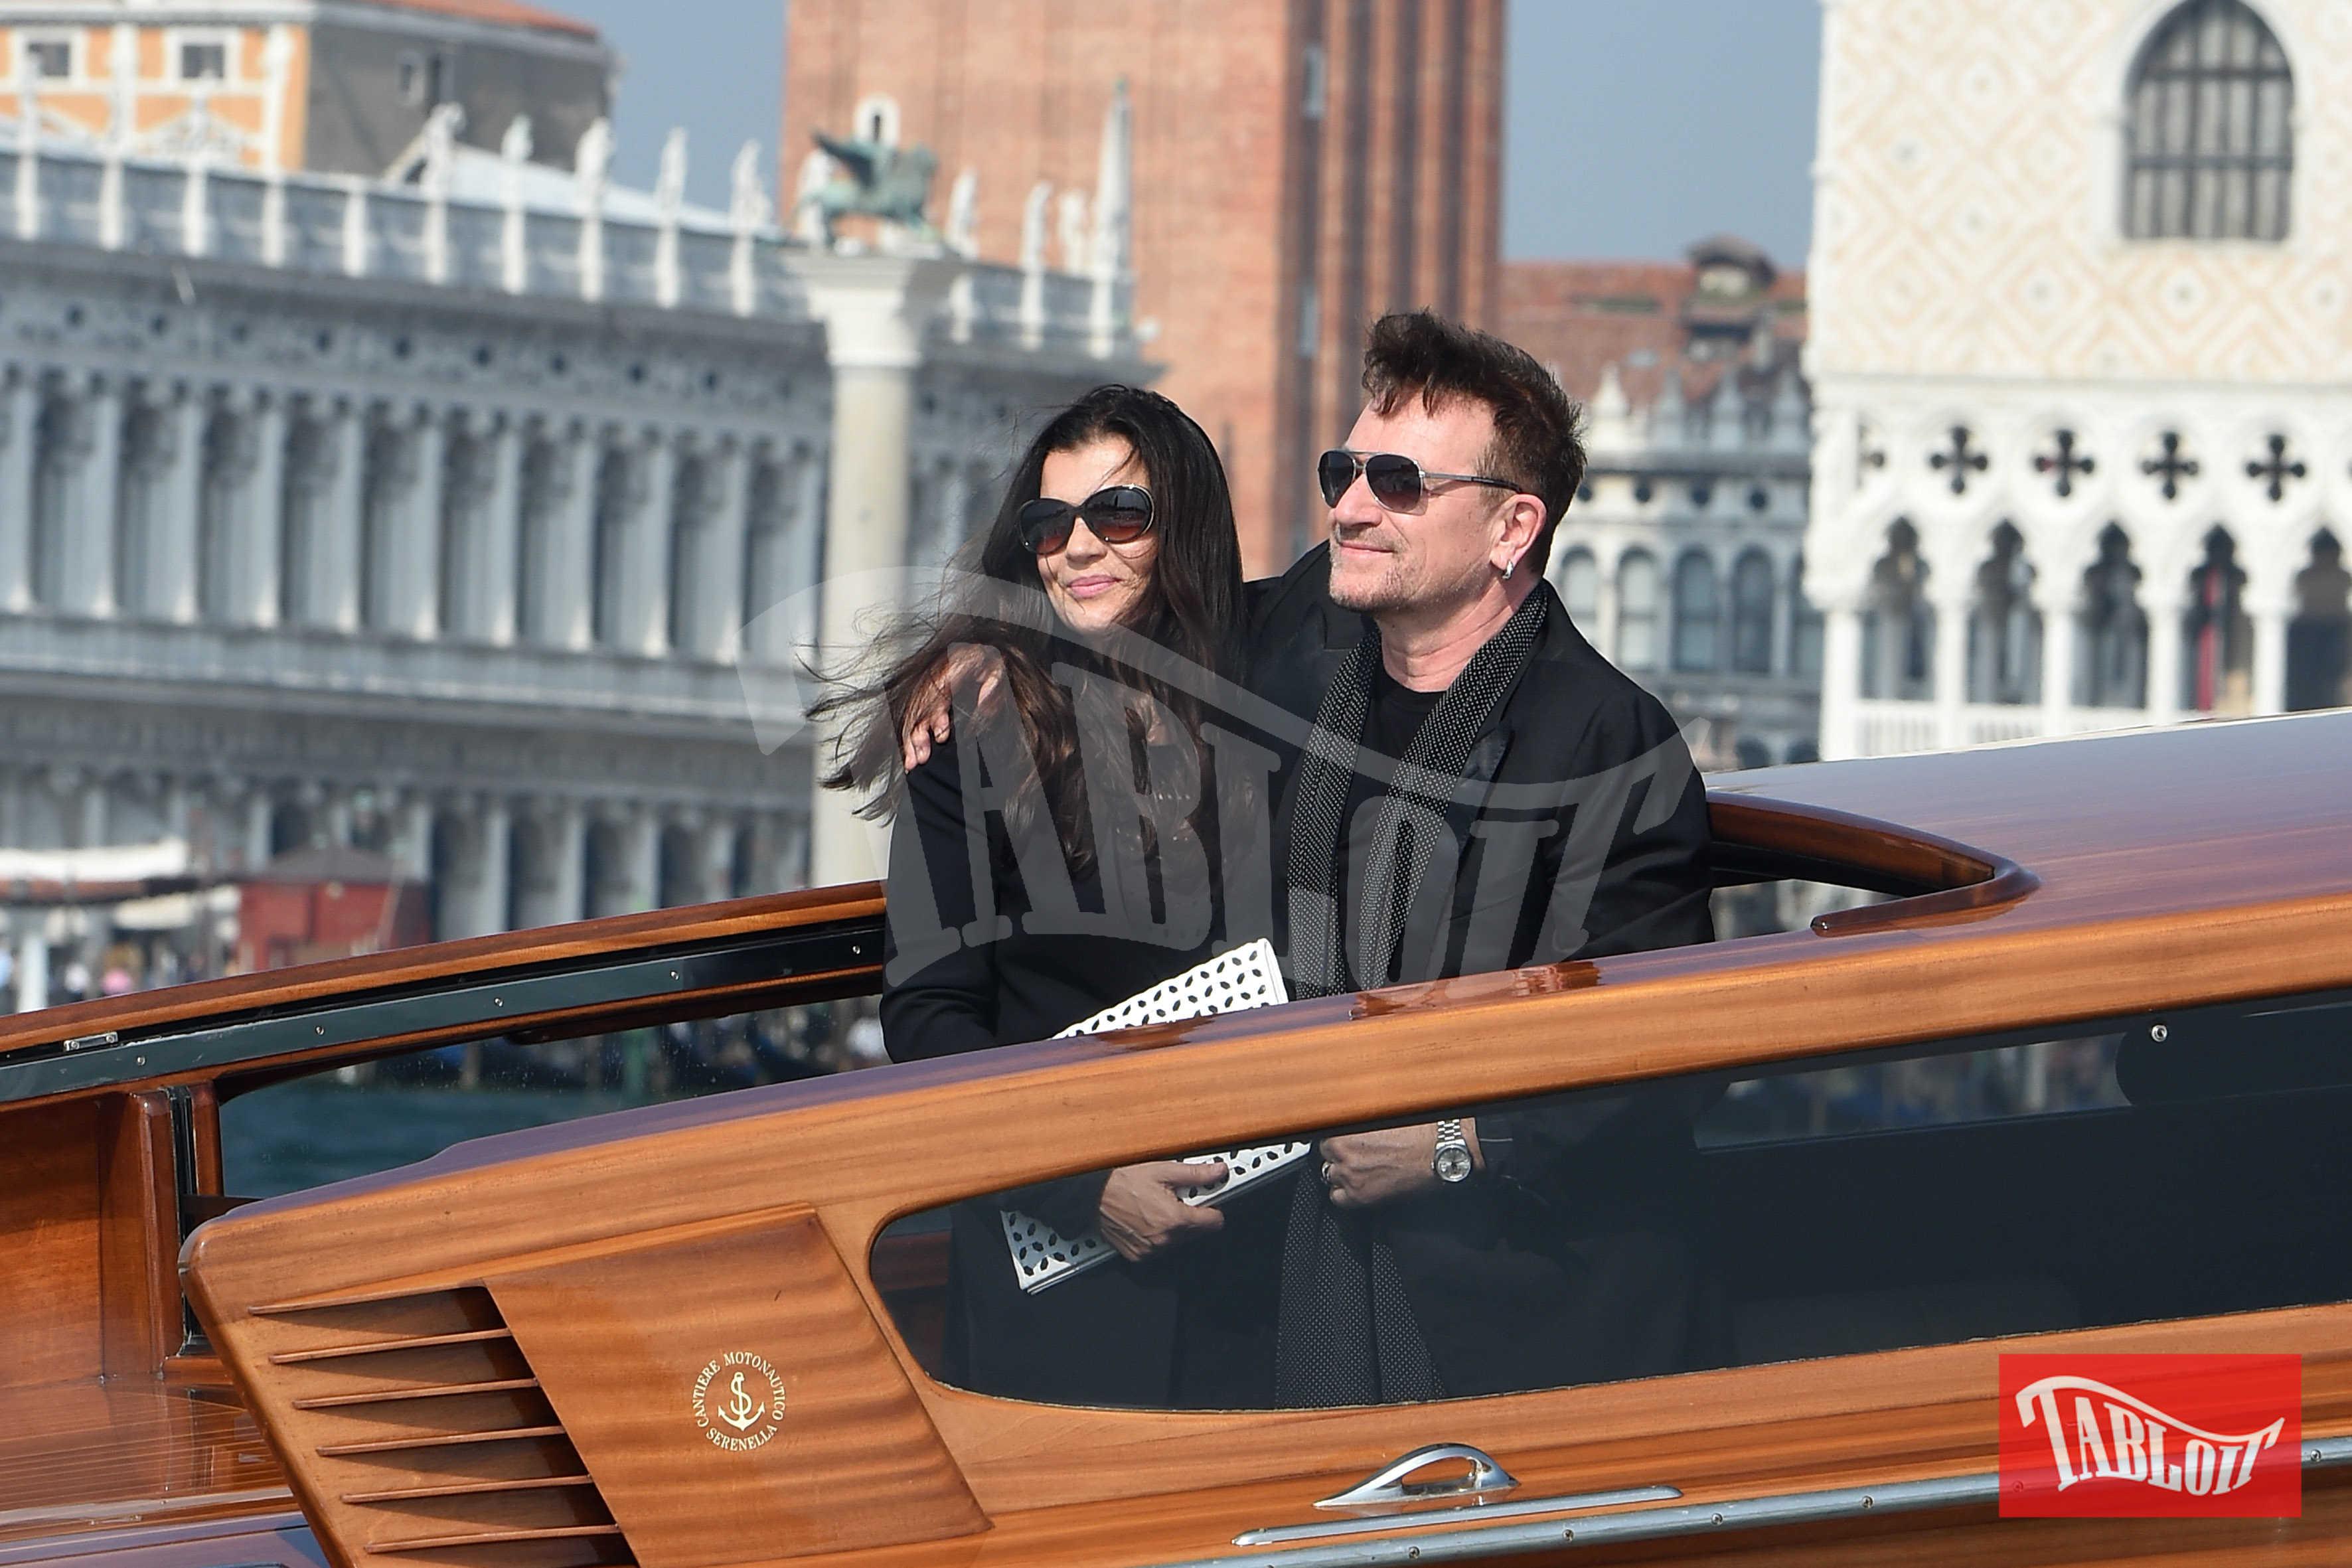 Bono Vox e la moglie Alison Stewart a Venezia